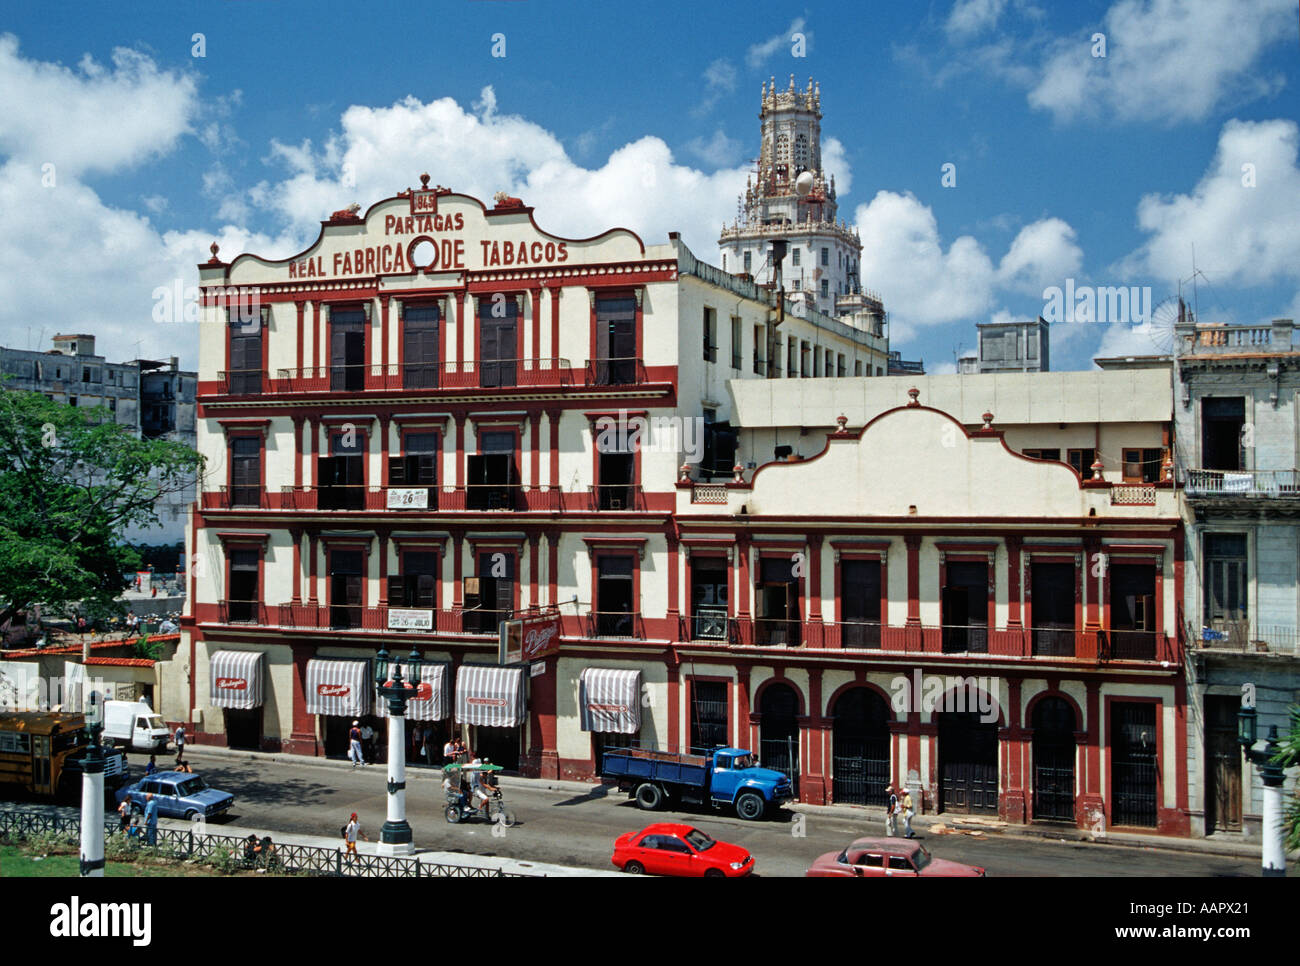 Partagas Real Fabrica de Tabacos Cigar factory Havana Cuba Founded 1845 - Stock Image